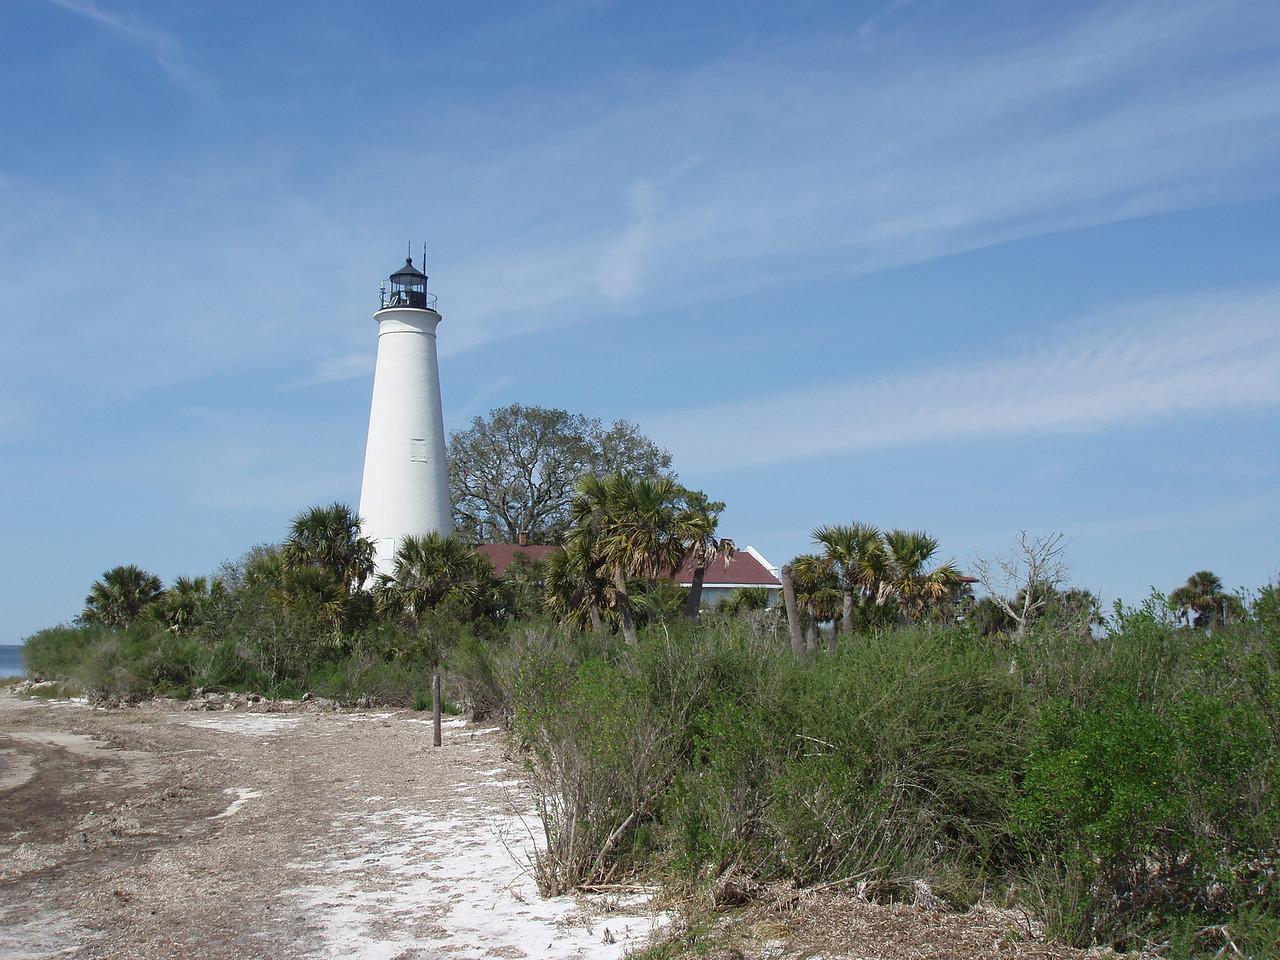 St. Marks Lighthouse<br /> PHOTO CREDIT: Robert Coveney / Florida Trail Association